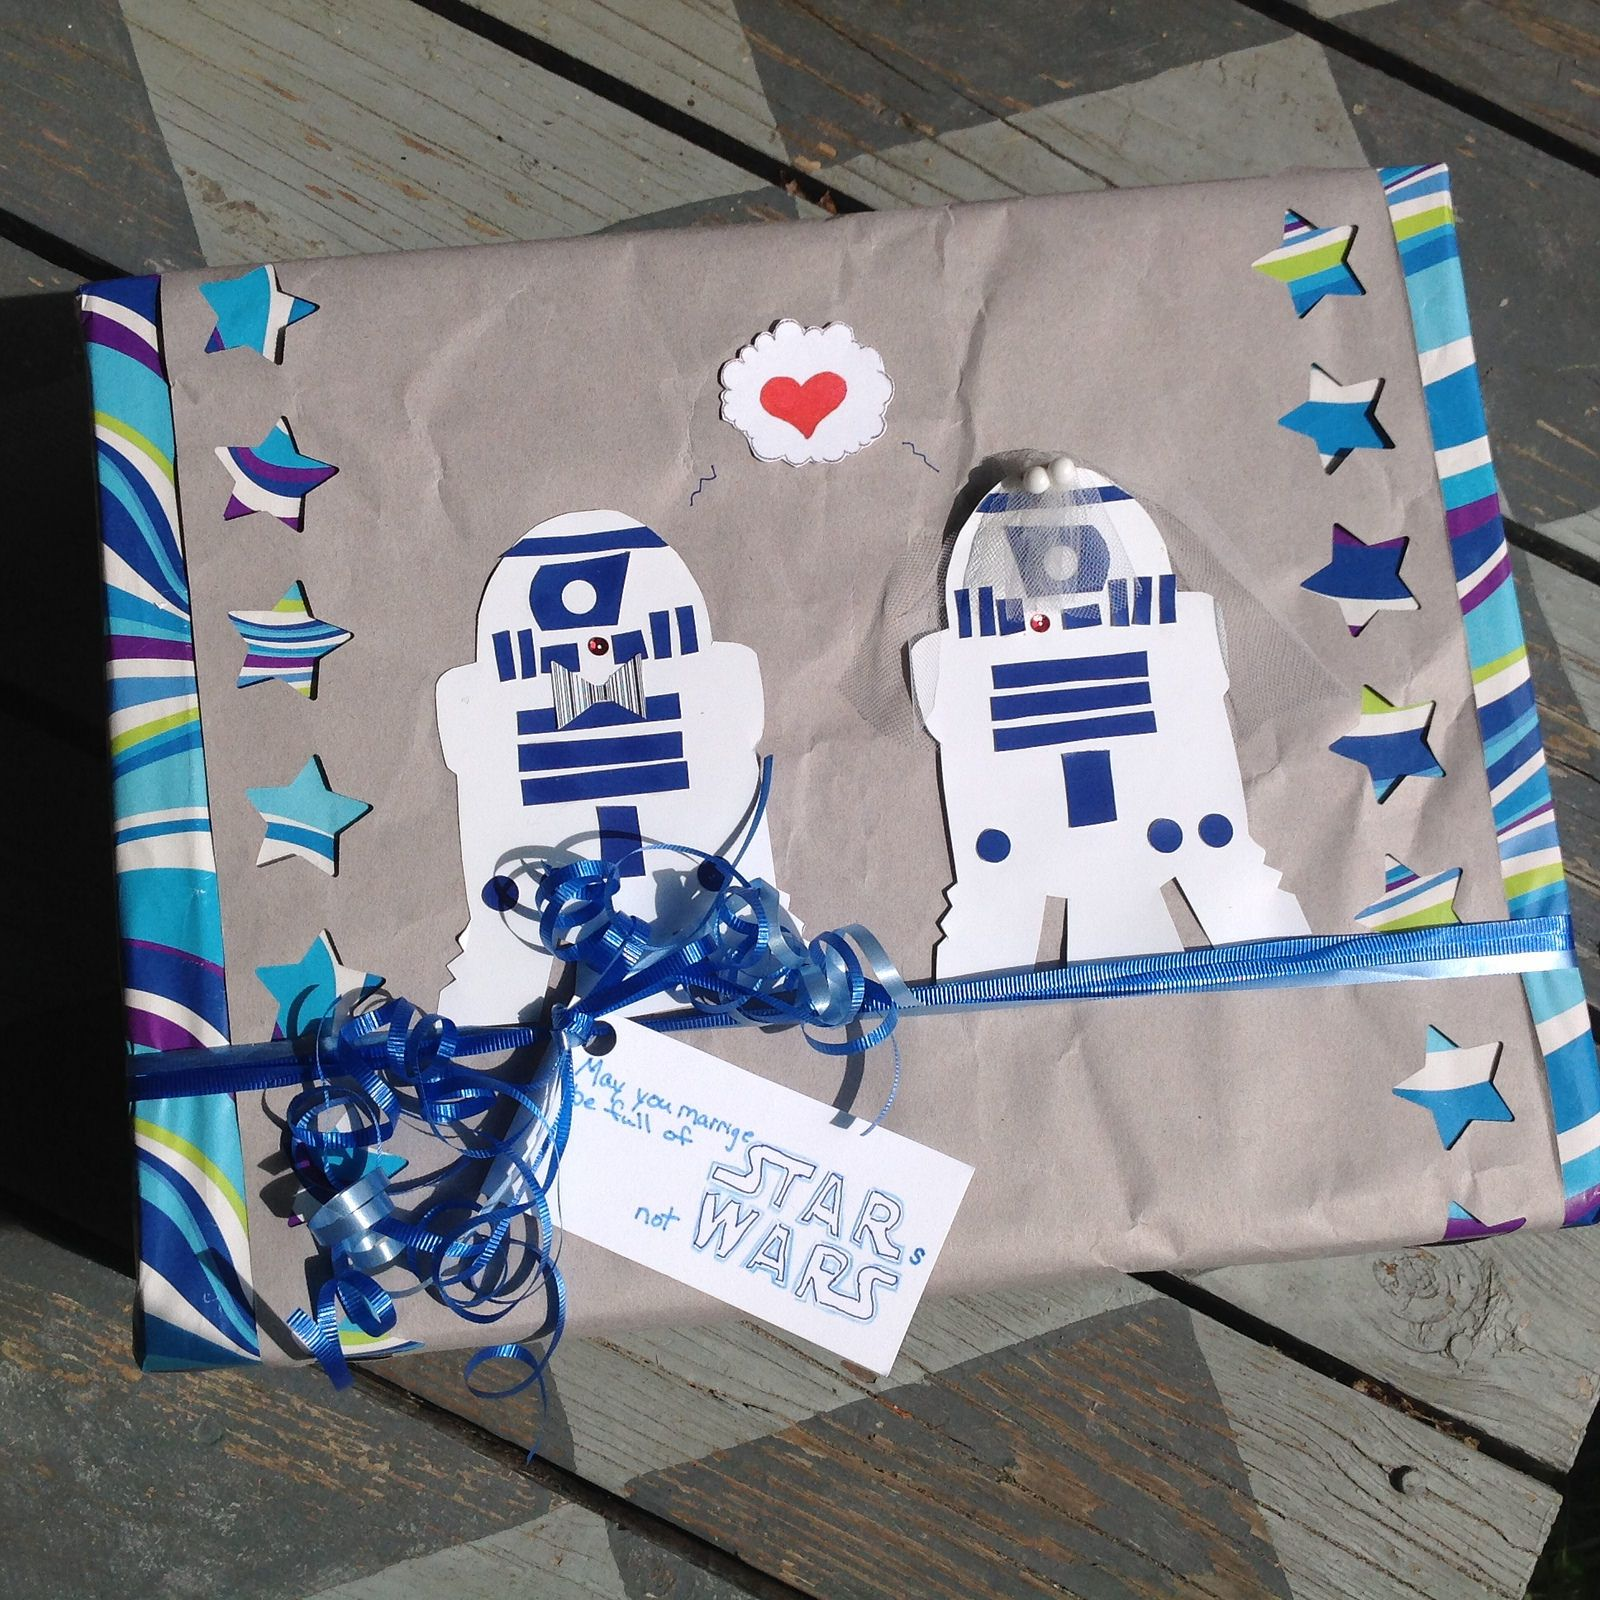 Star Wars Wedding Gifts: Star Wars Wedding Gift Wrap